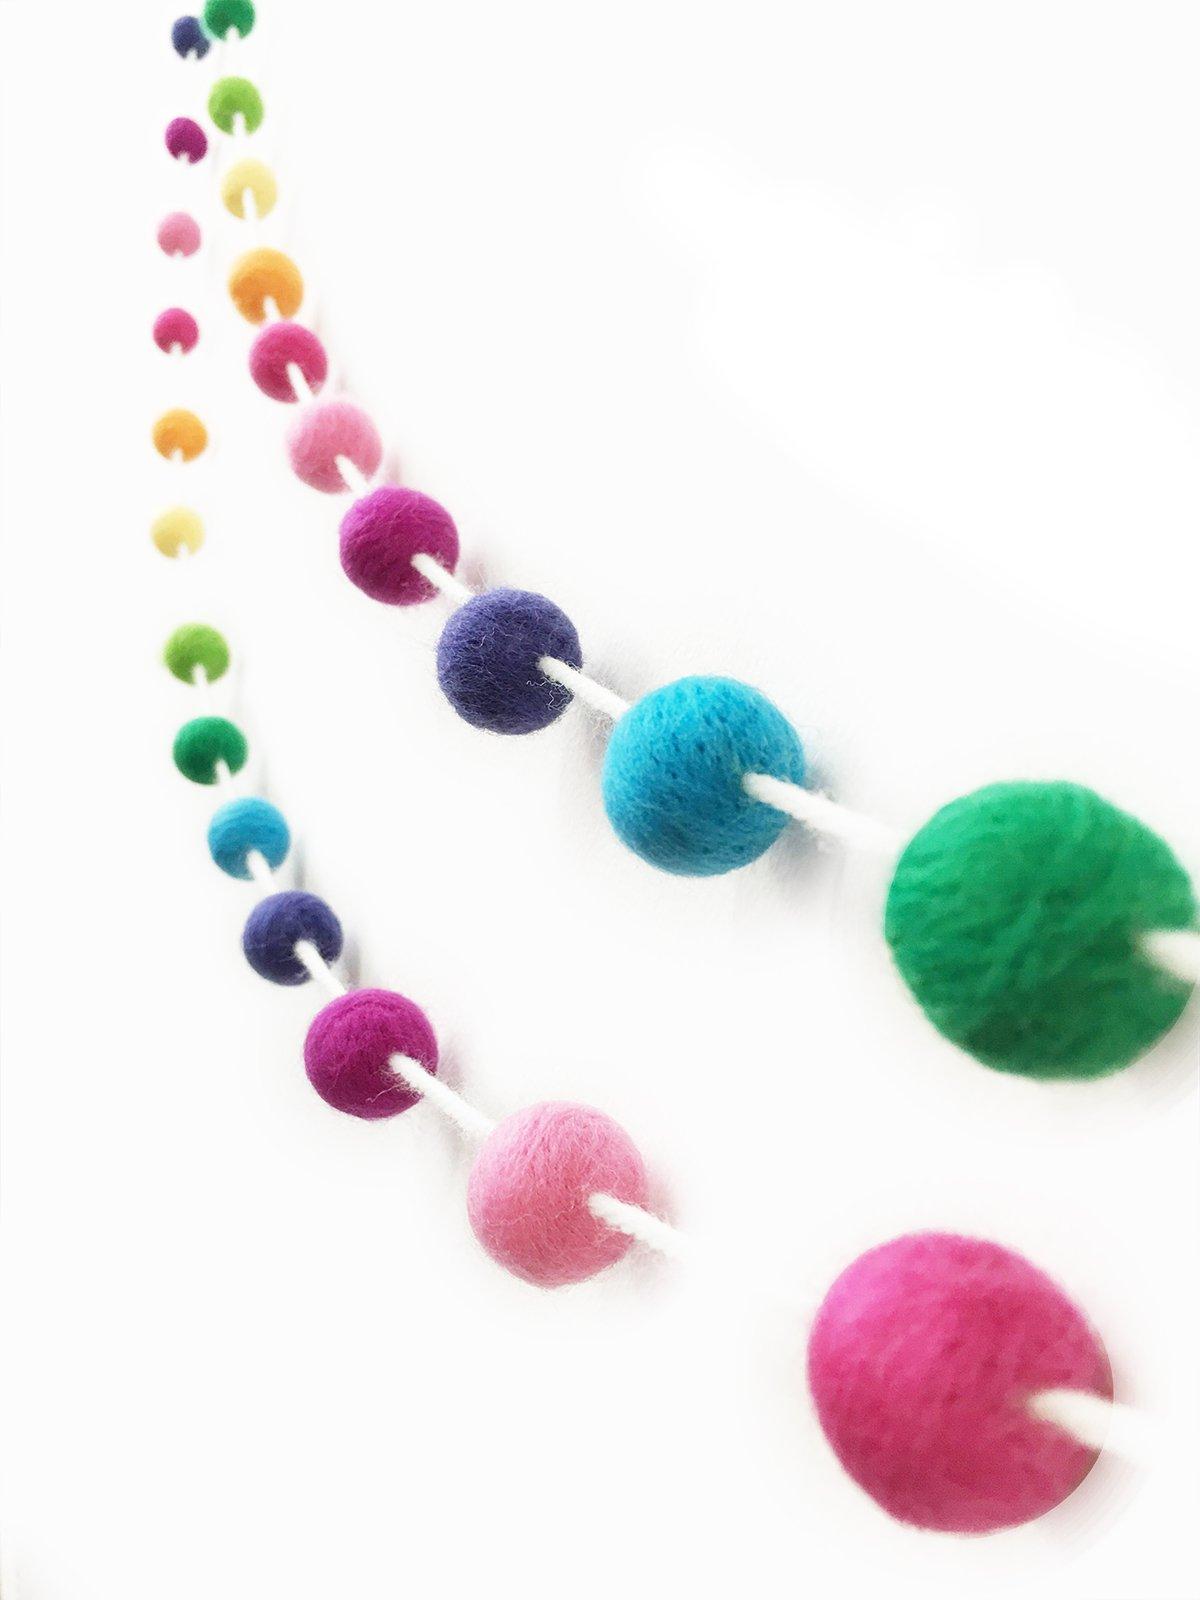 silk flower arrangements misscrafts felt ball garland 9.8 feet 100% wool roving pom pom garland 35 balls 20mm colorful for baby shower grand opening party festivals room decorations